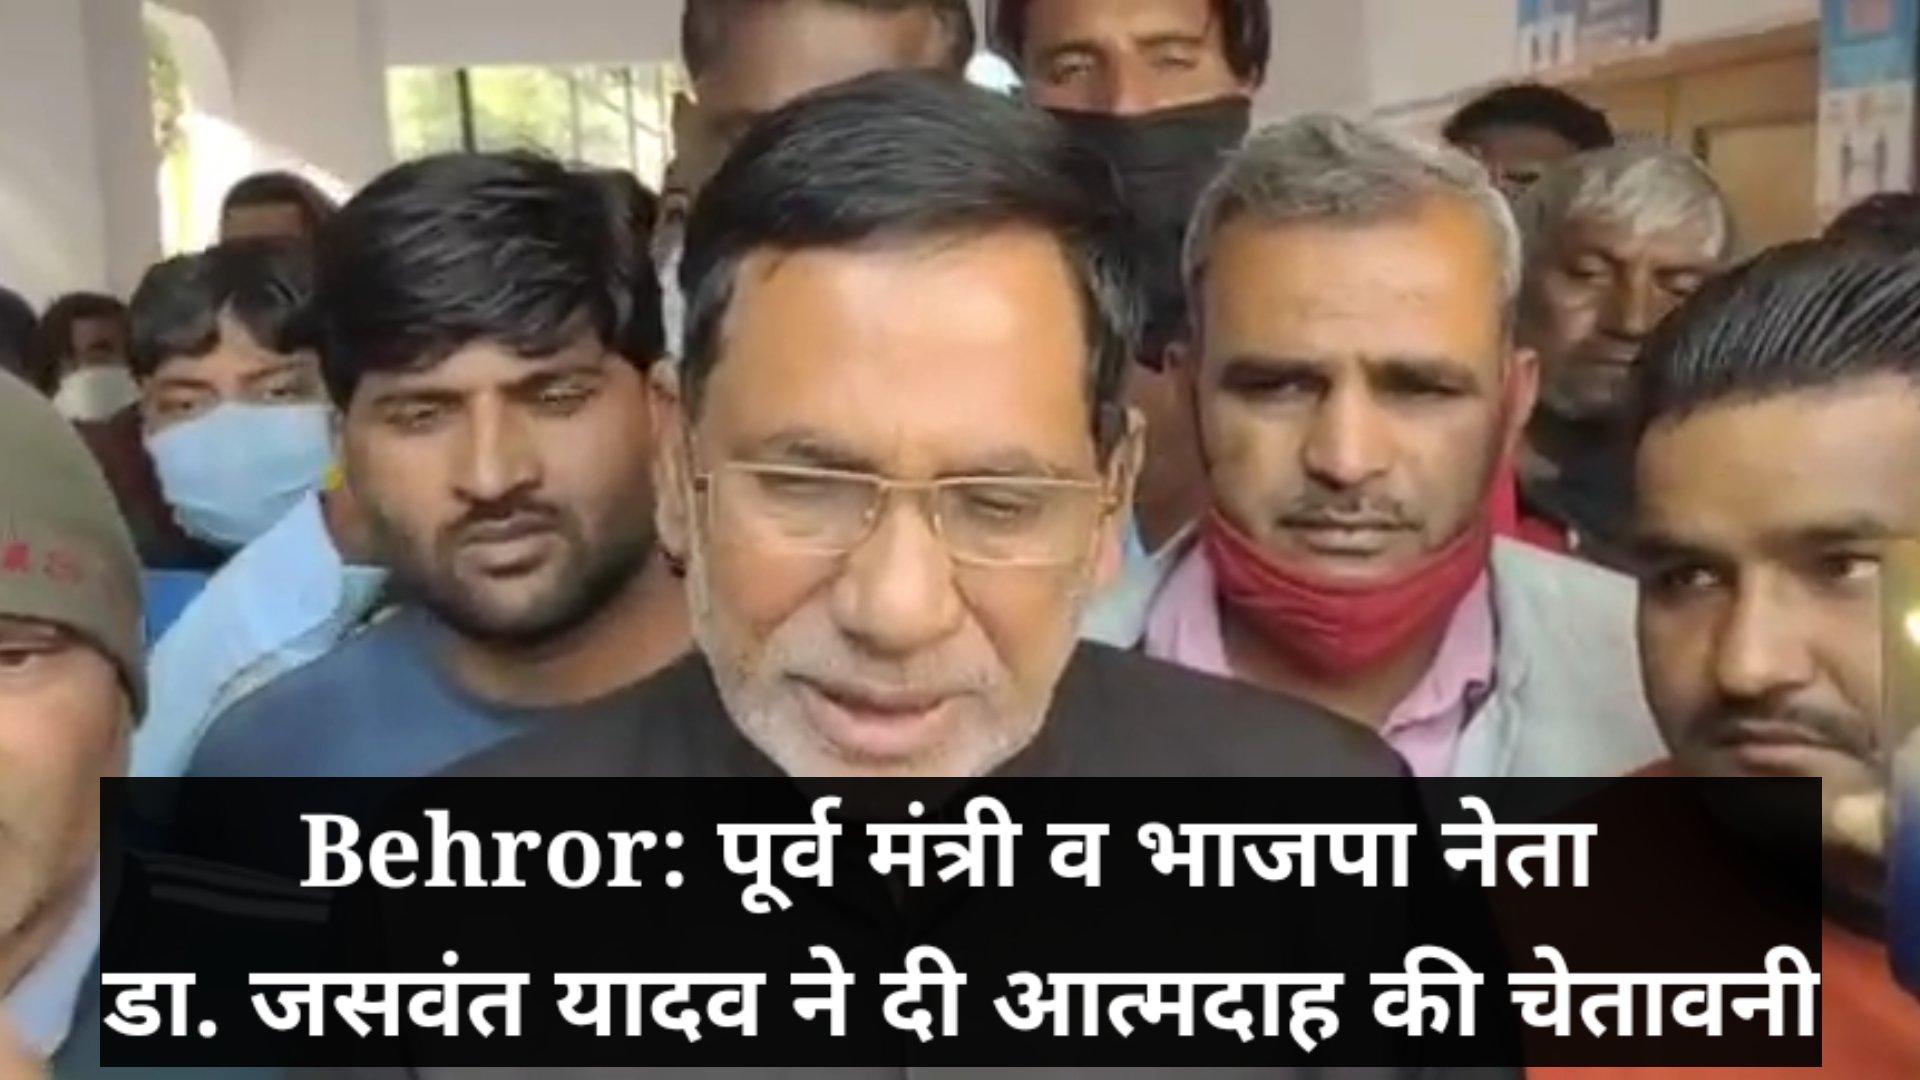 Behror: Former Rajasthan minister and BJP leader Jaswant Yadav warns of self-immolation